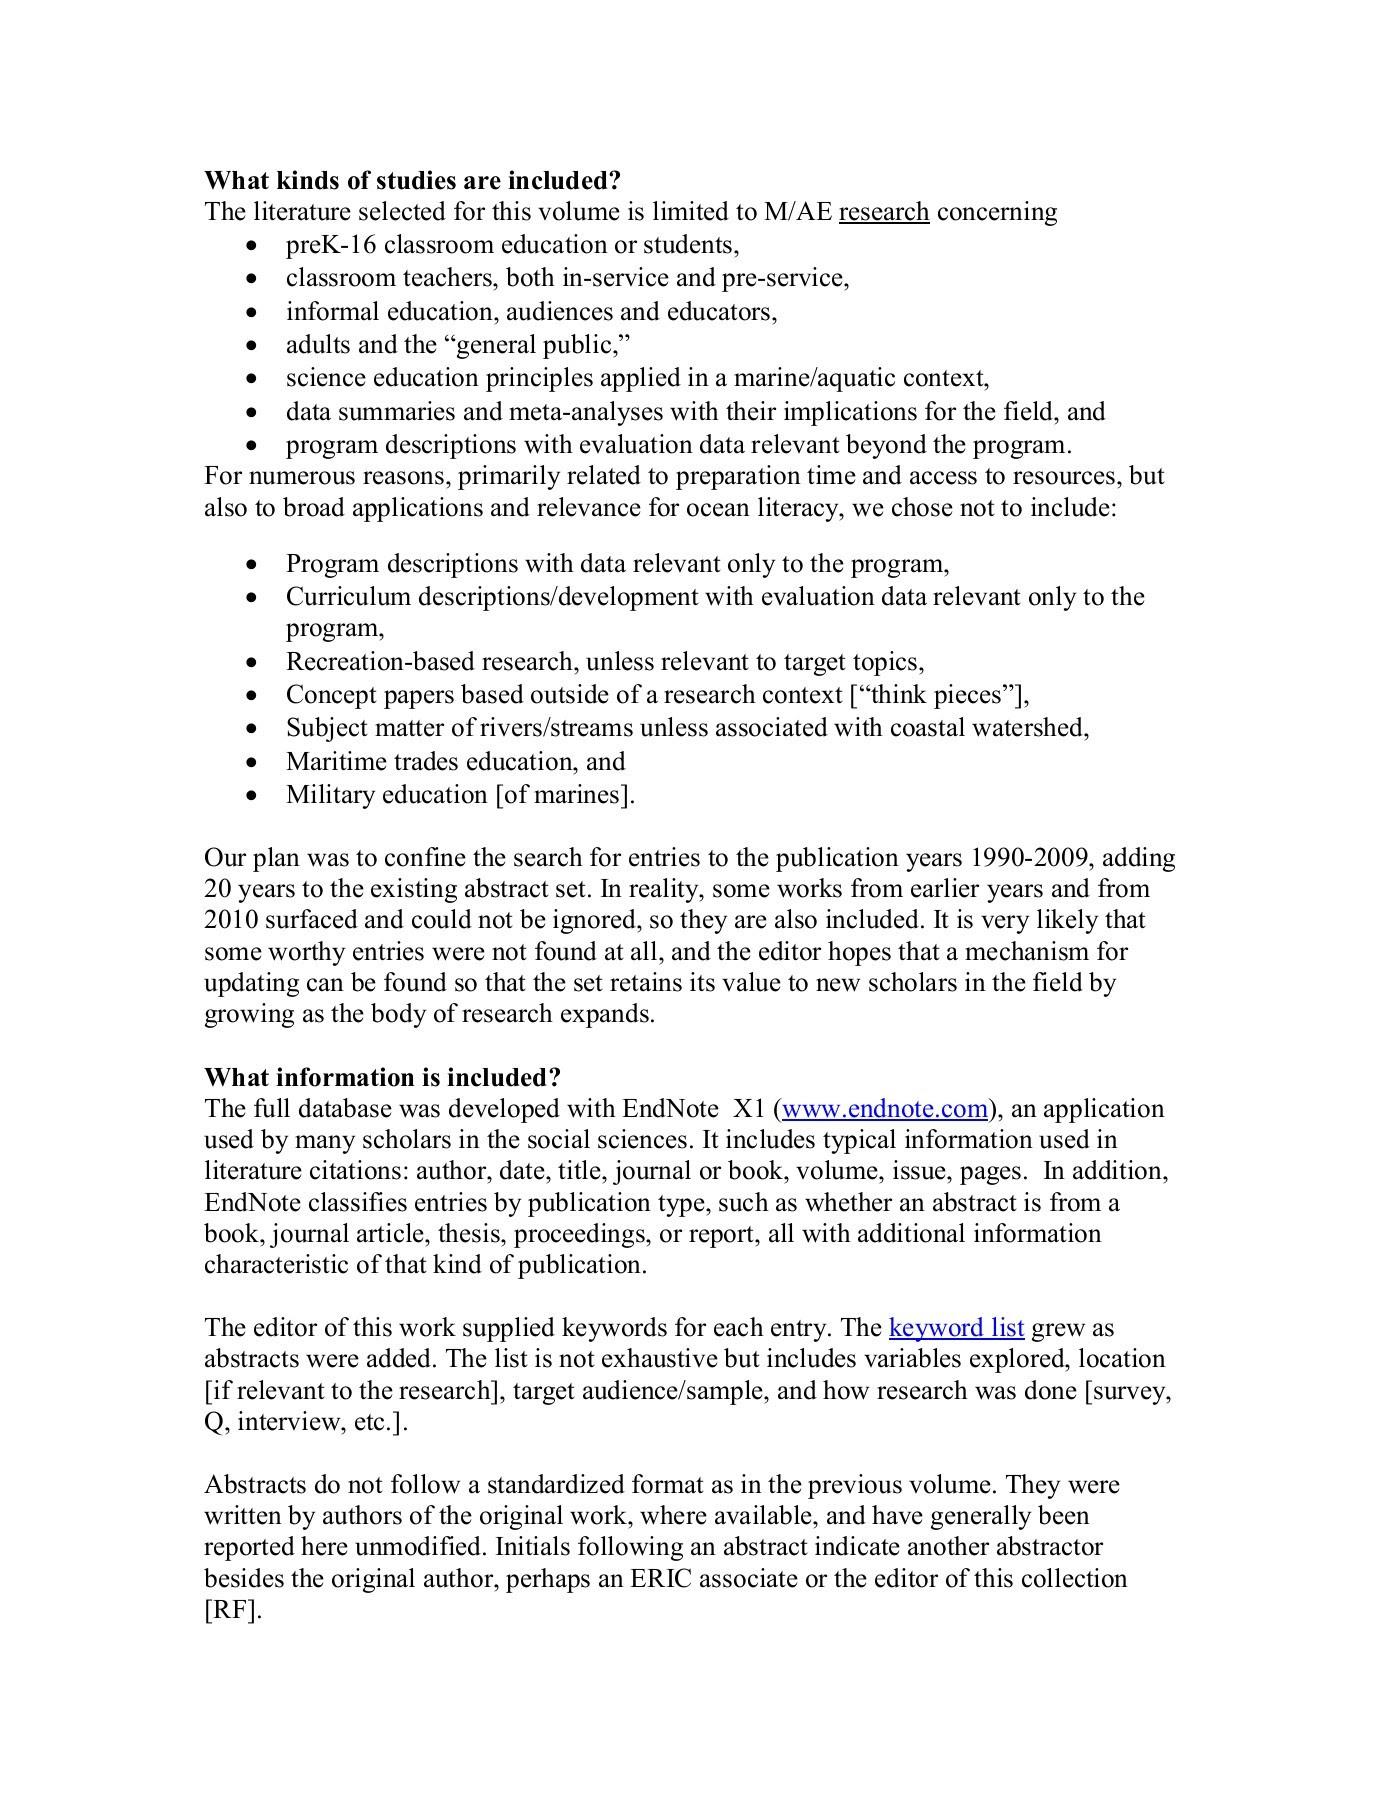 Internationa terrorism essays